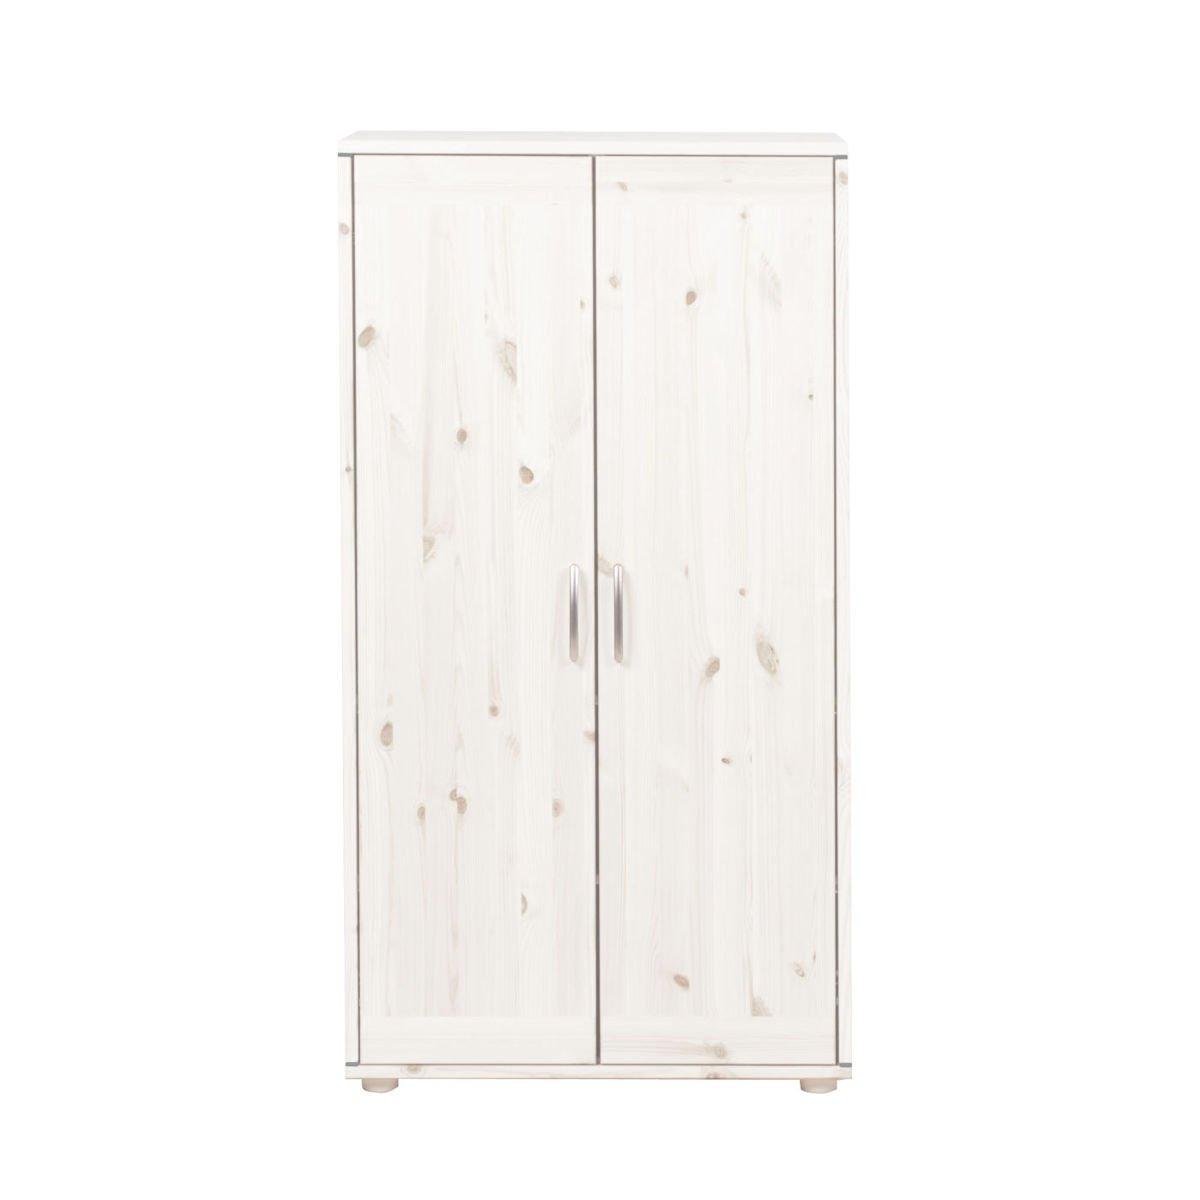 kleiderschrank 2 t ren wei grey grey 358. Black Bedroom Furniture Sets. Home Design Ideas